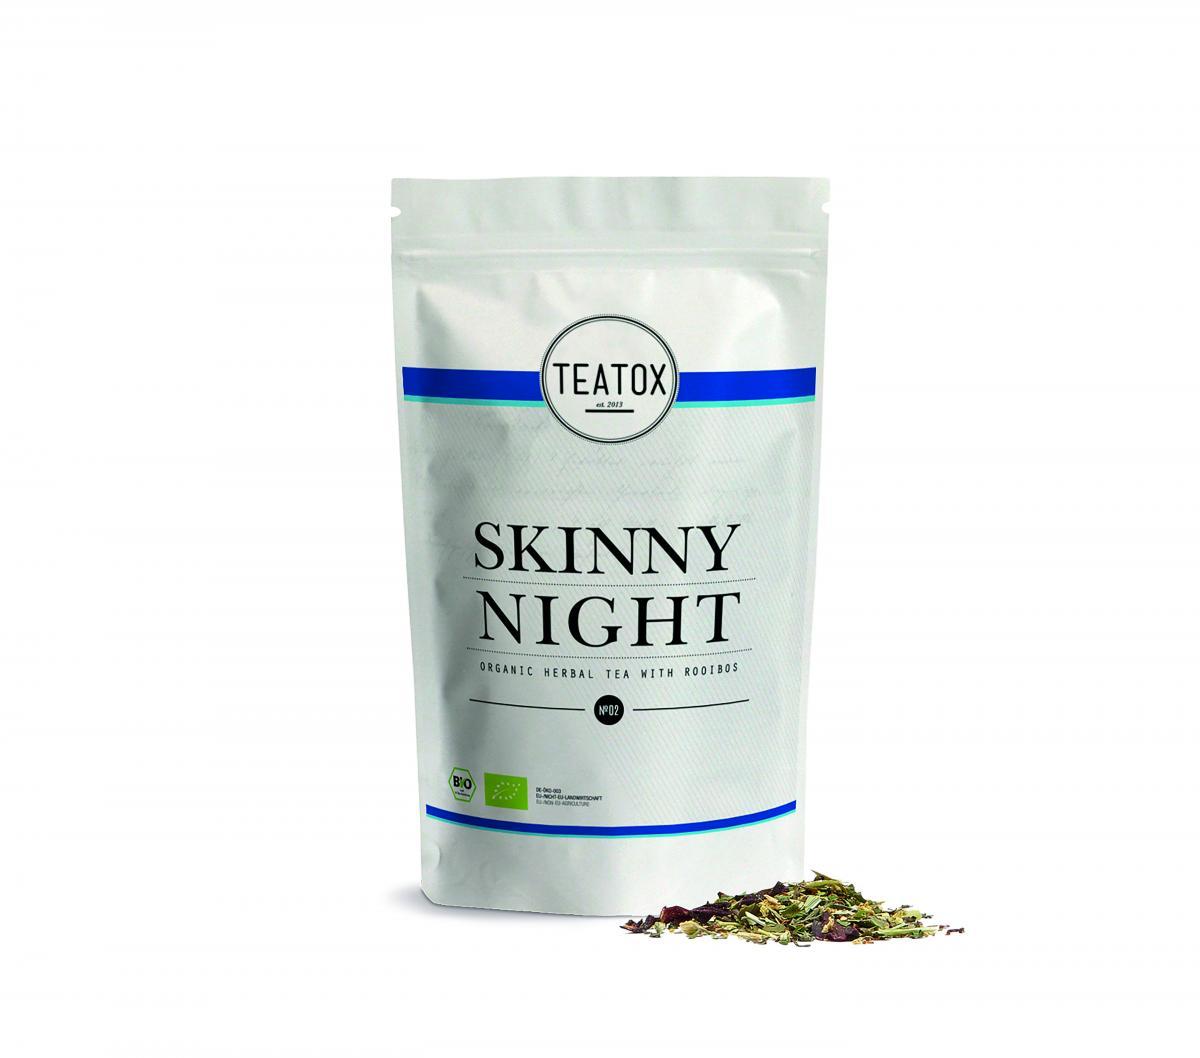 Skinny Night 50g, utántöltő